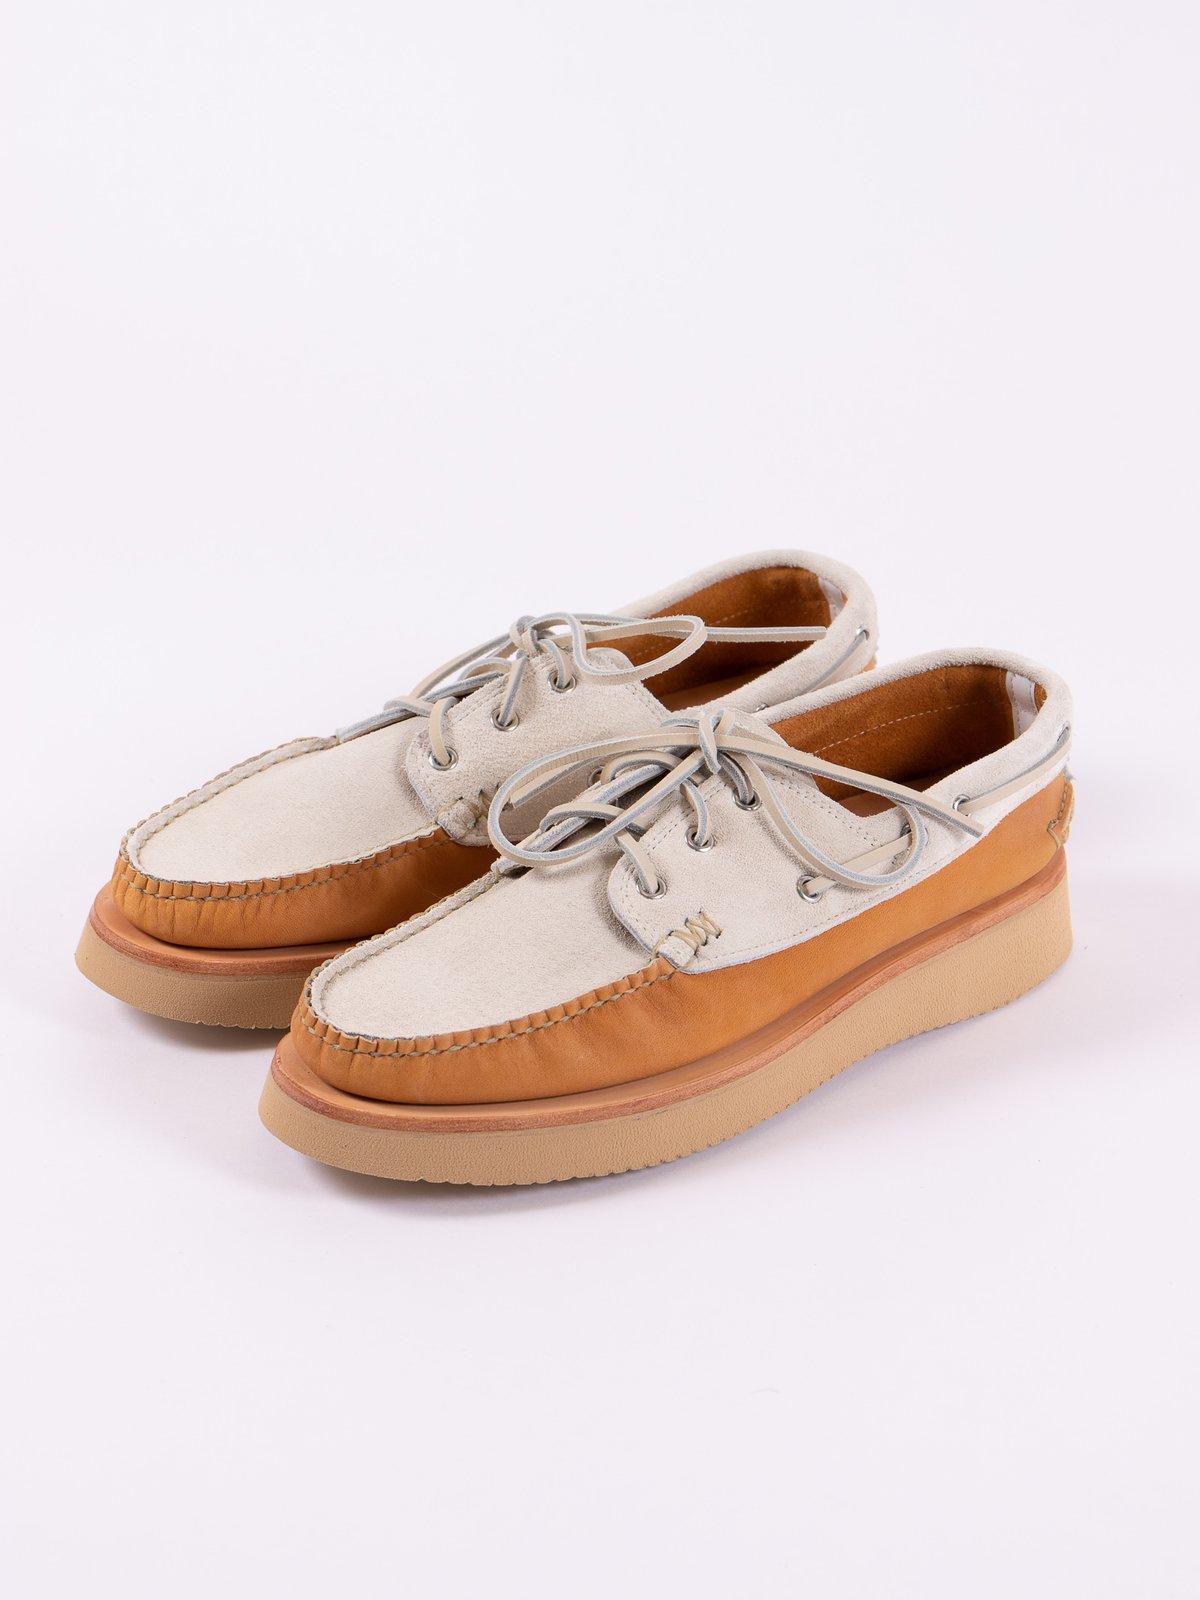 BB Tan/FO White Boat Shoe Exclusive - Image 2